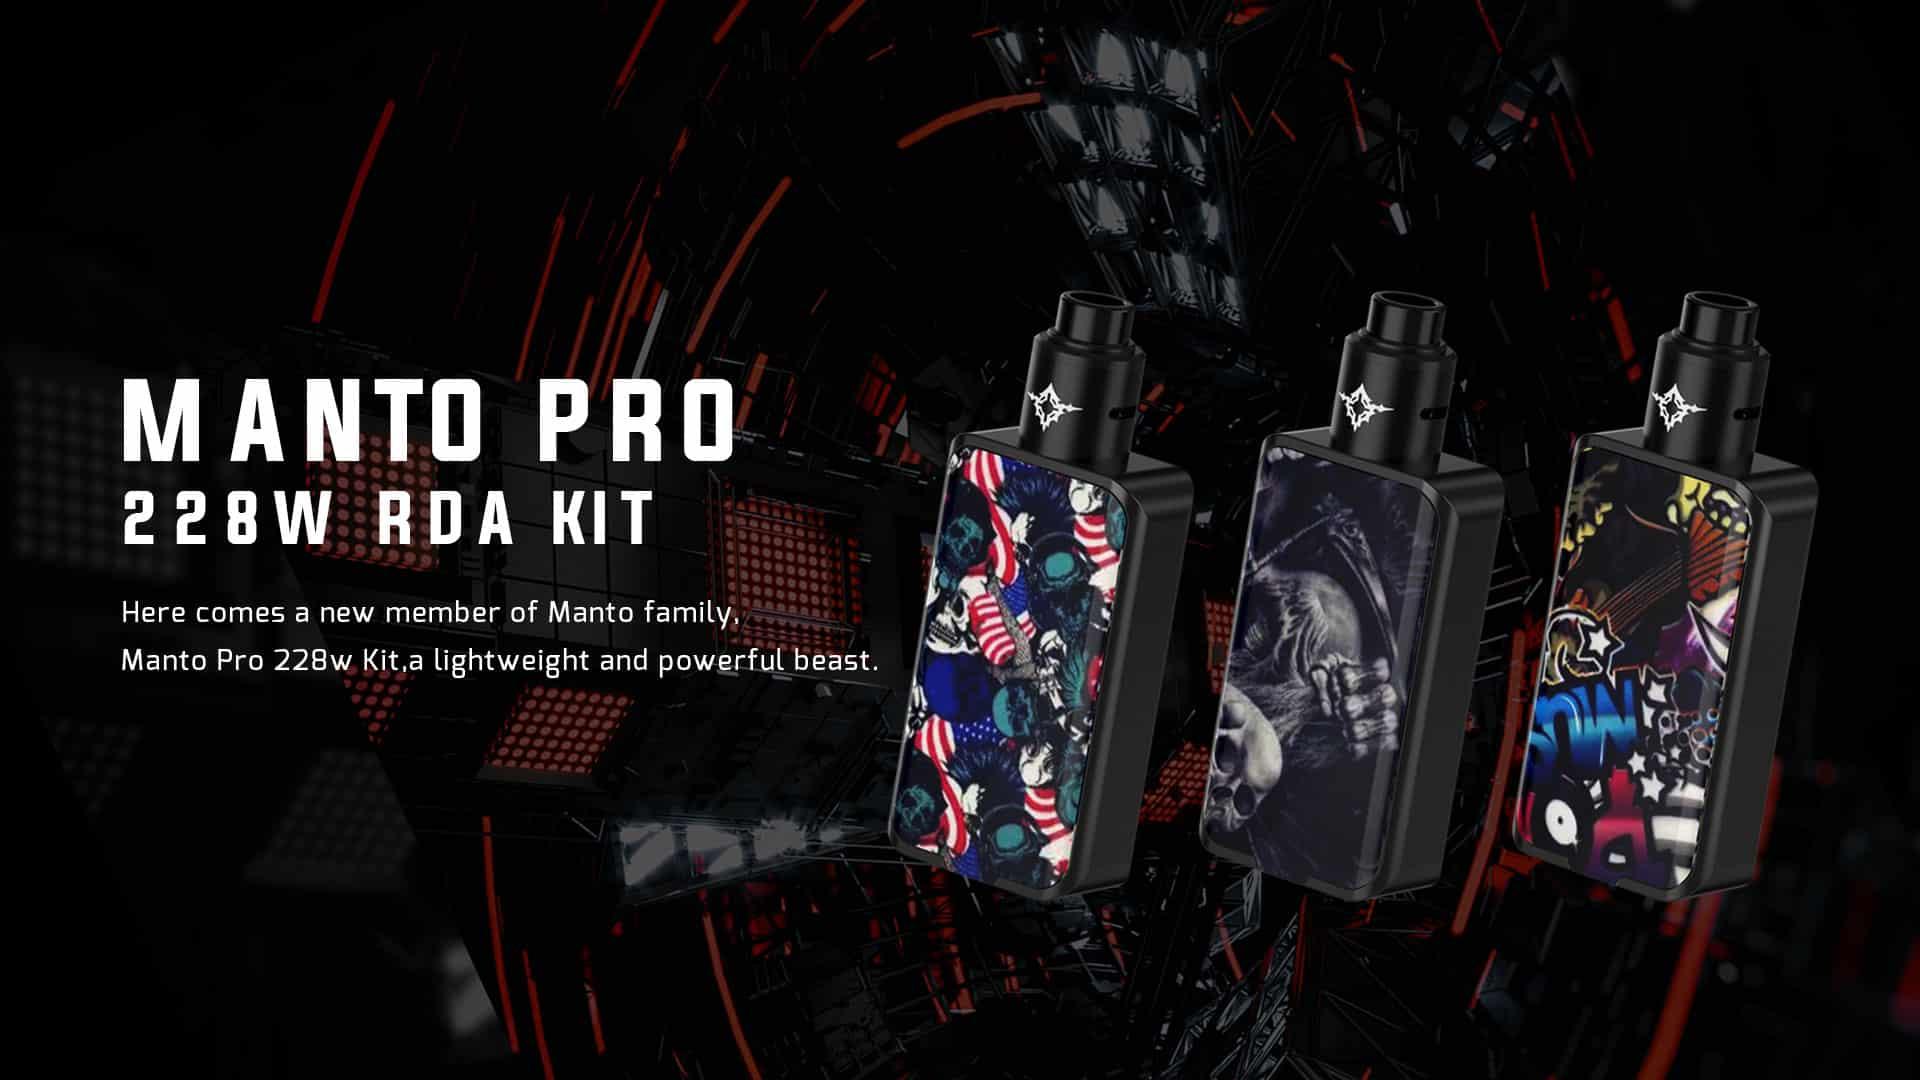 Manto pro kit 228w by rincoe